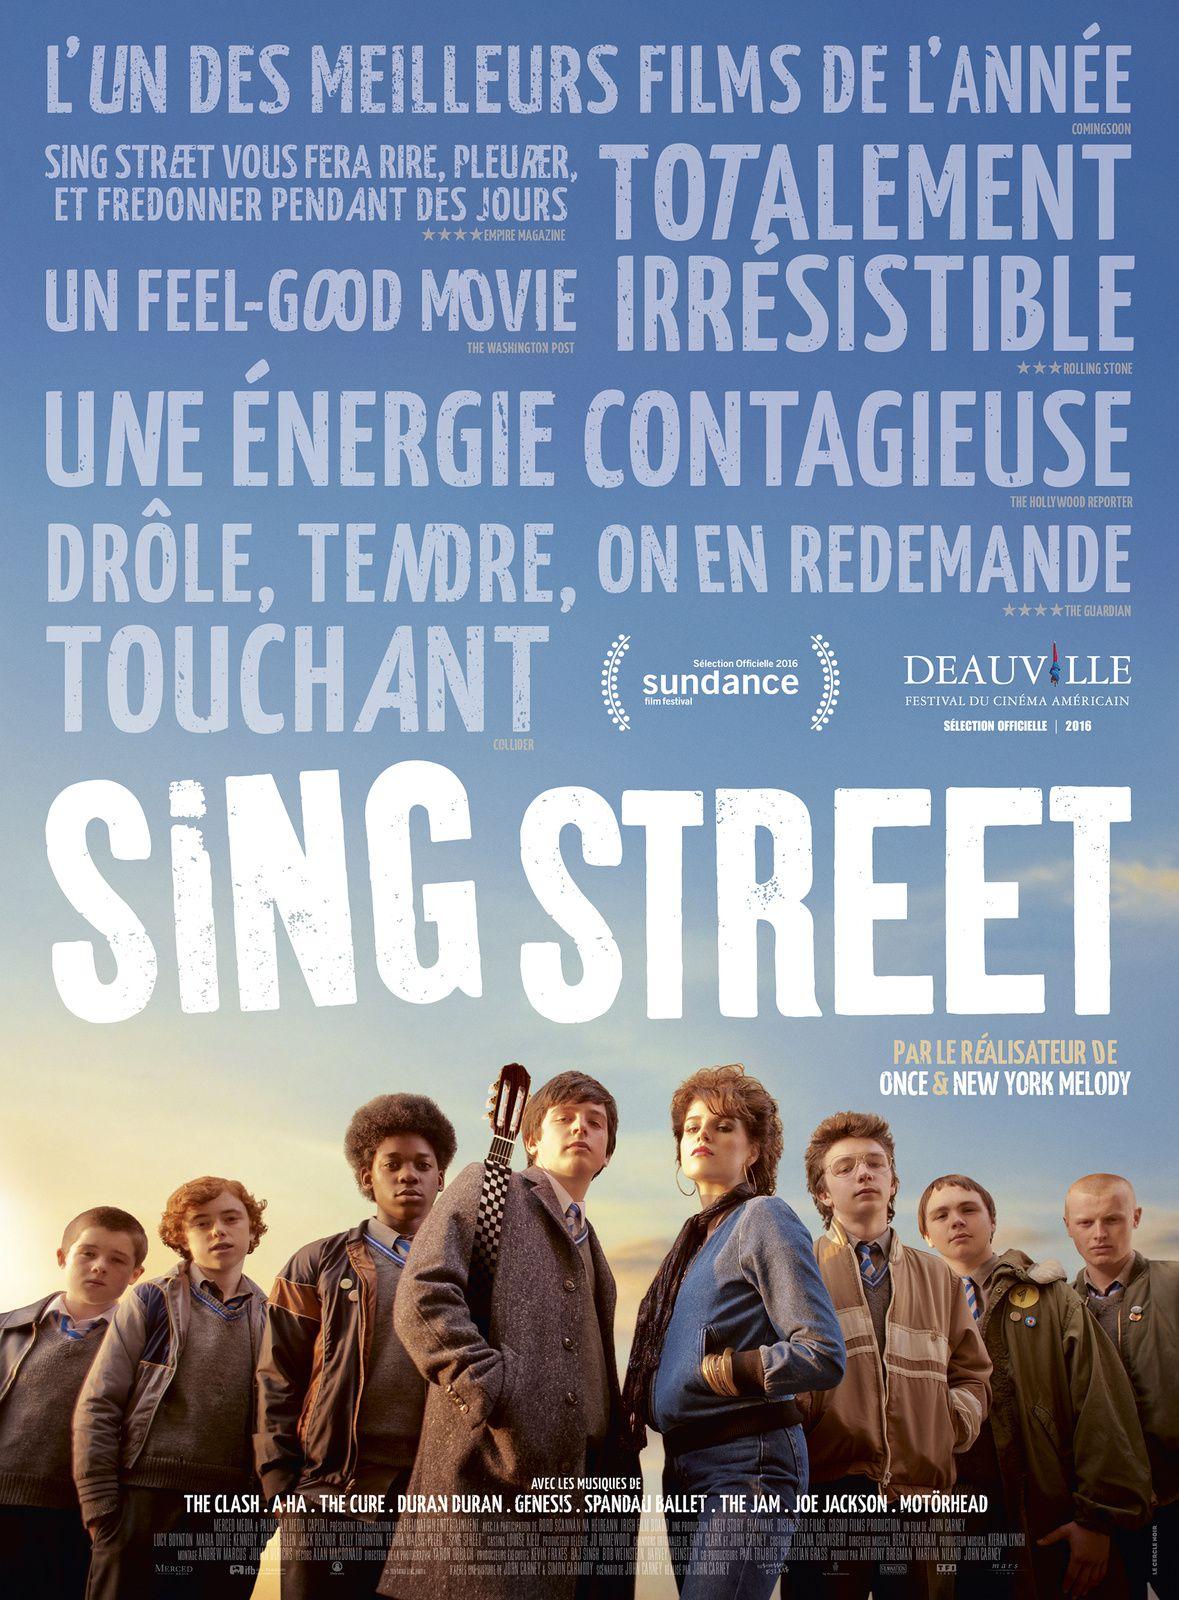 Sing Street (BANDE ANNONCE VOST) avec Aidan Gillen, Maria Doyle Kennedy, Jack Reynor - Le 26 octobre 2016 au cinéma